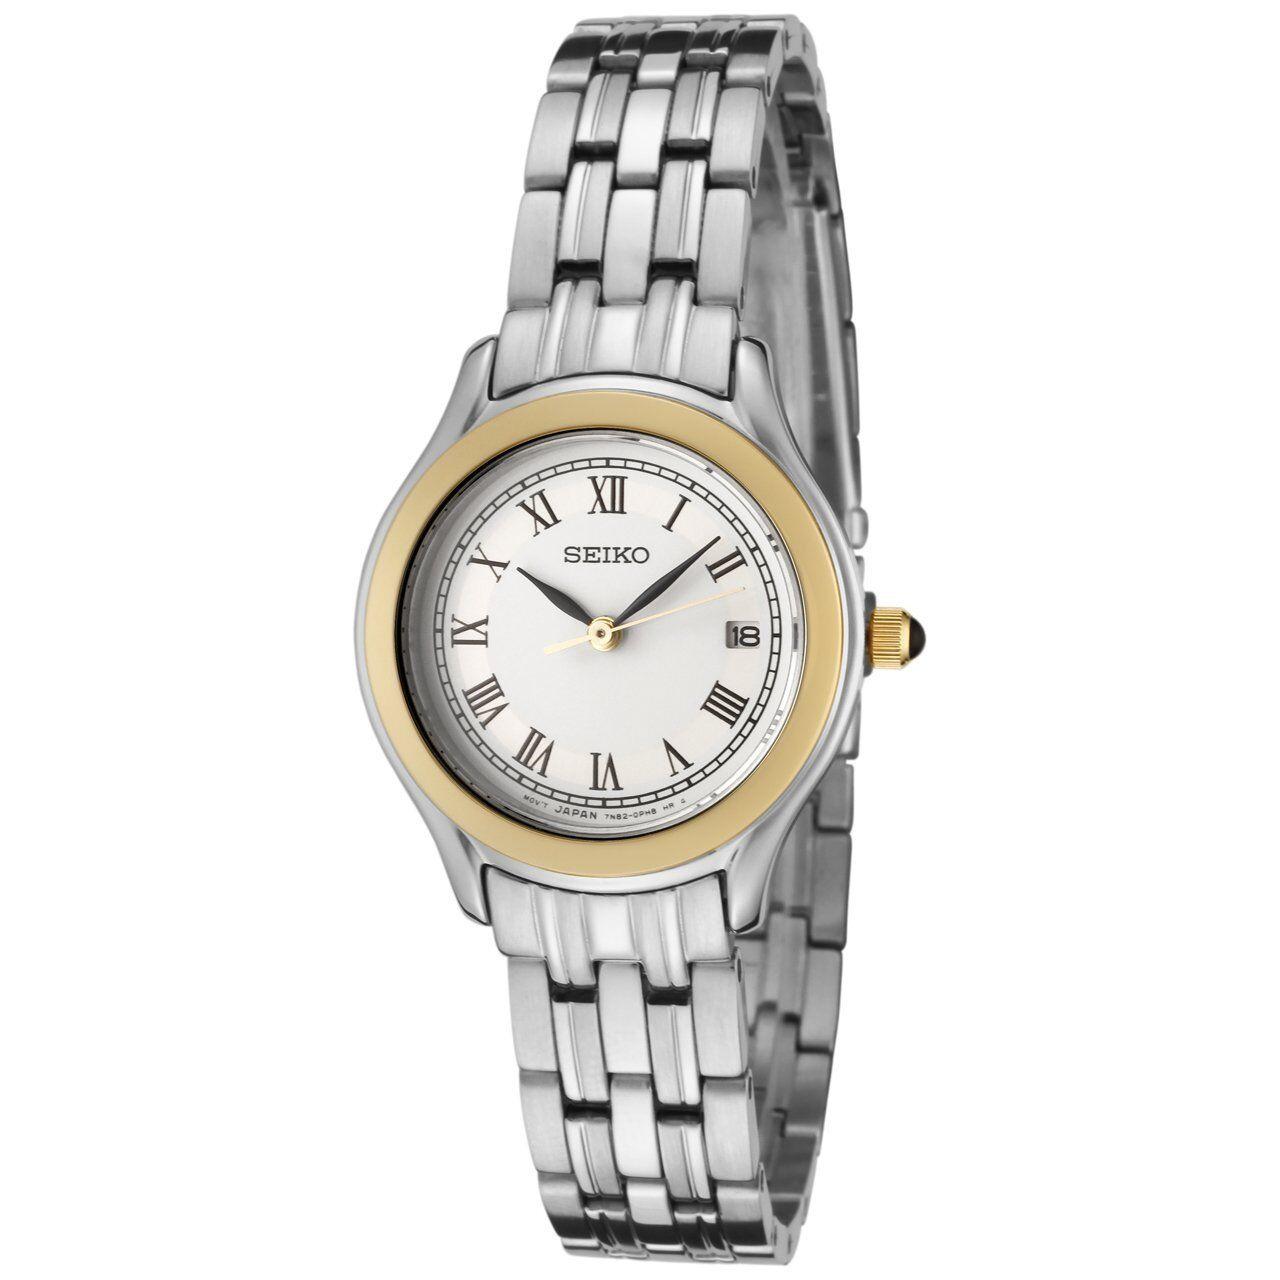 Seiko Ladies Analogue White Dial Stainless Steel Bracelet Watch